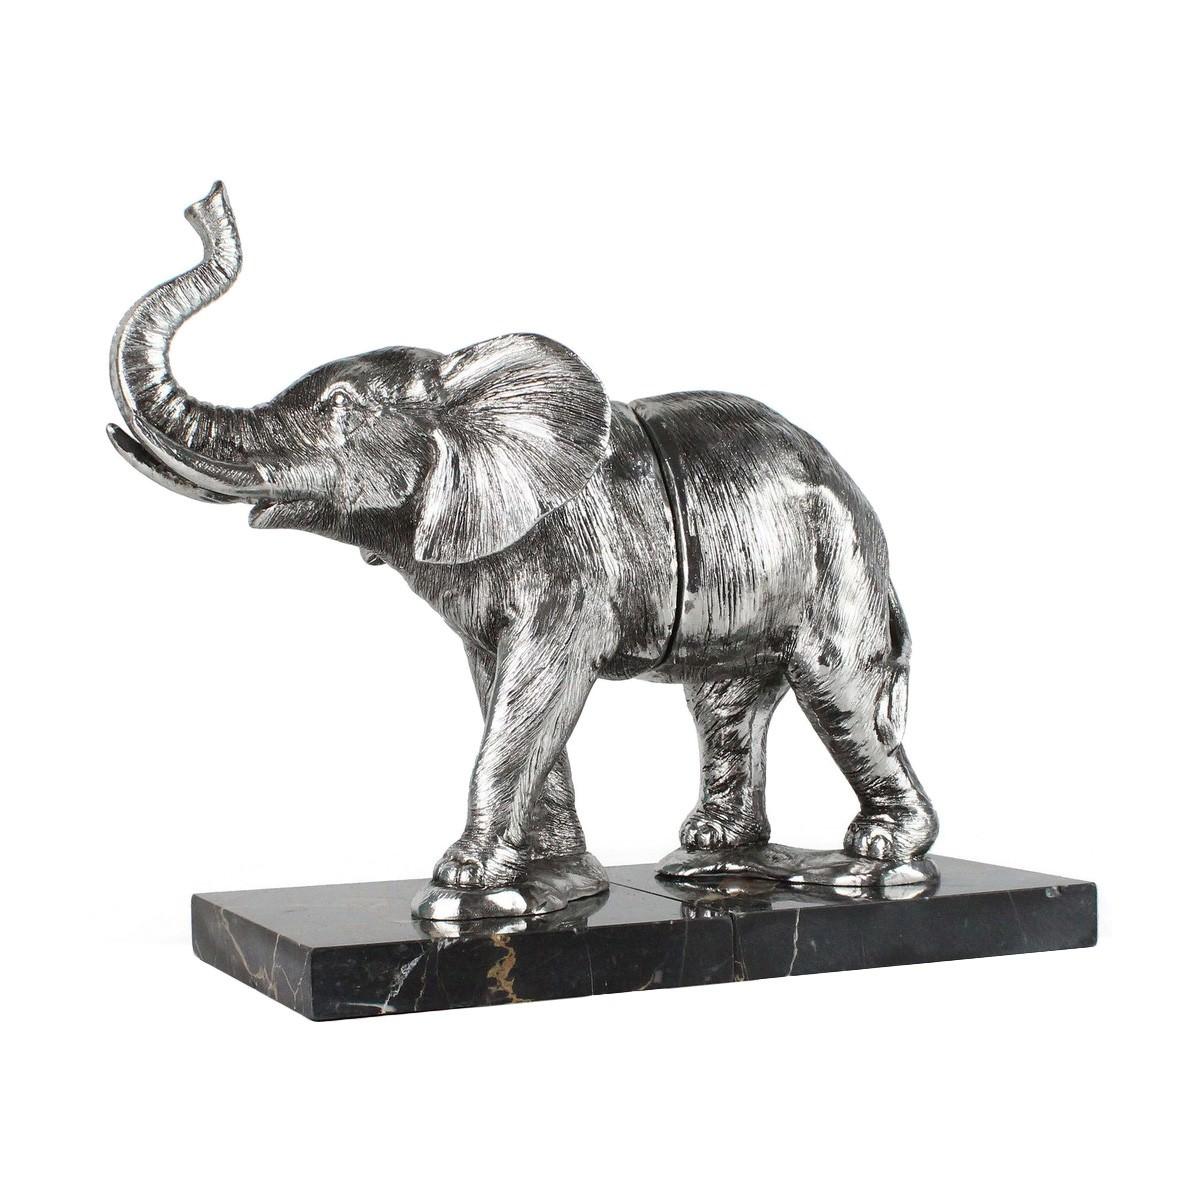 Barnard Elephant Bookend Set